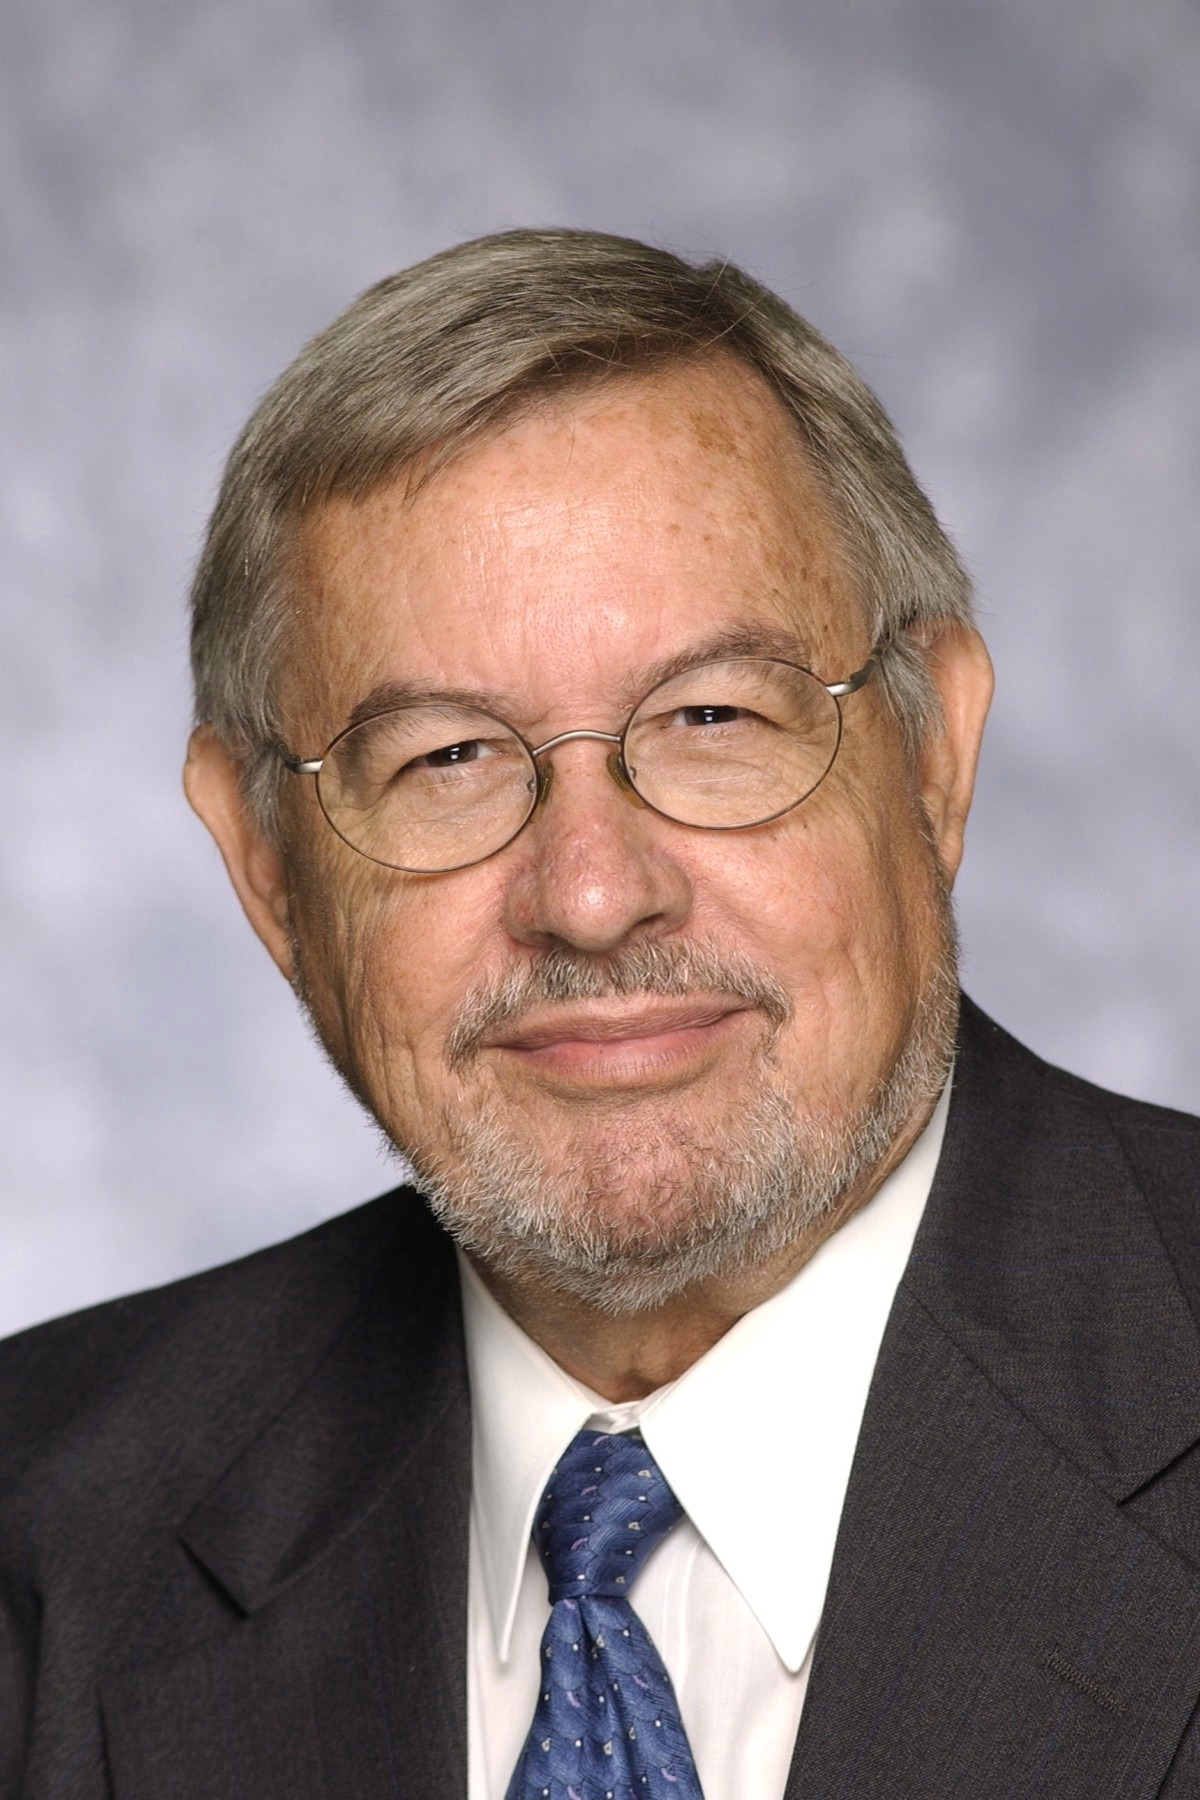 Dr-Gene-Scruggs-Wins-Wellness-Award